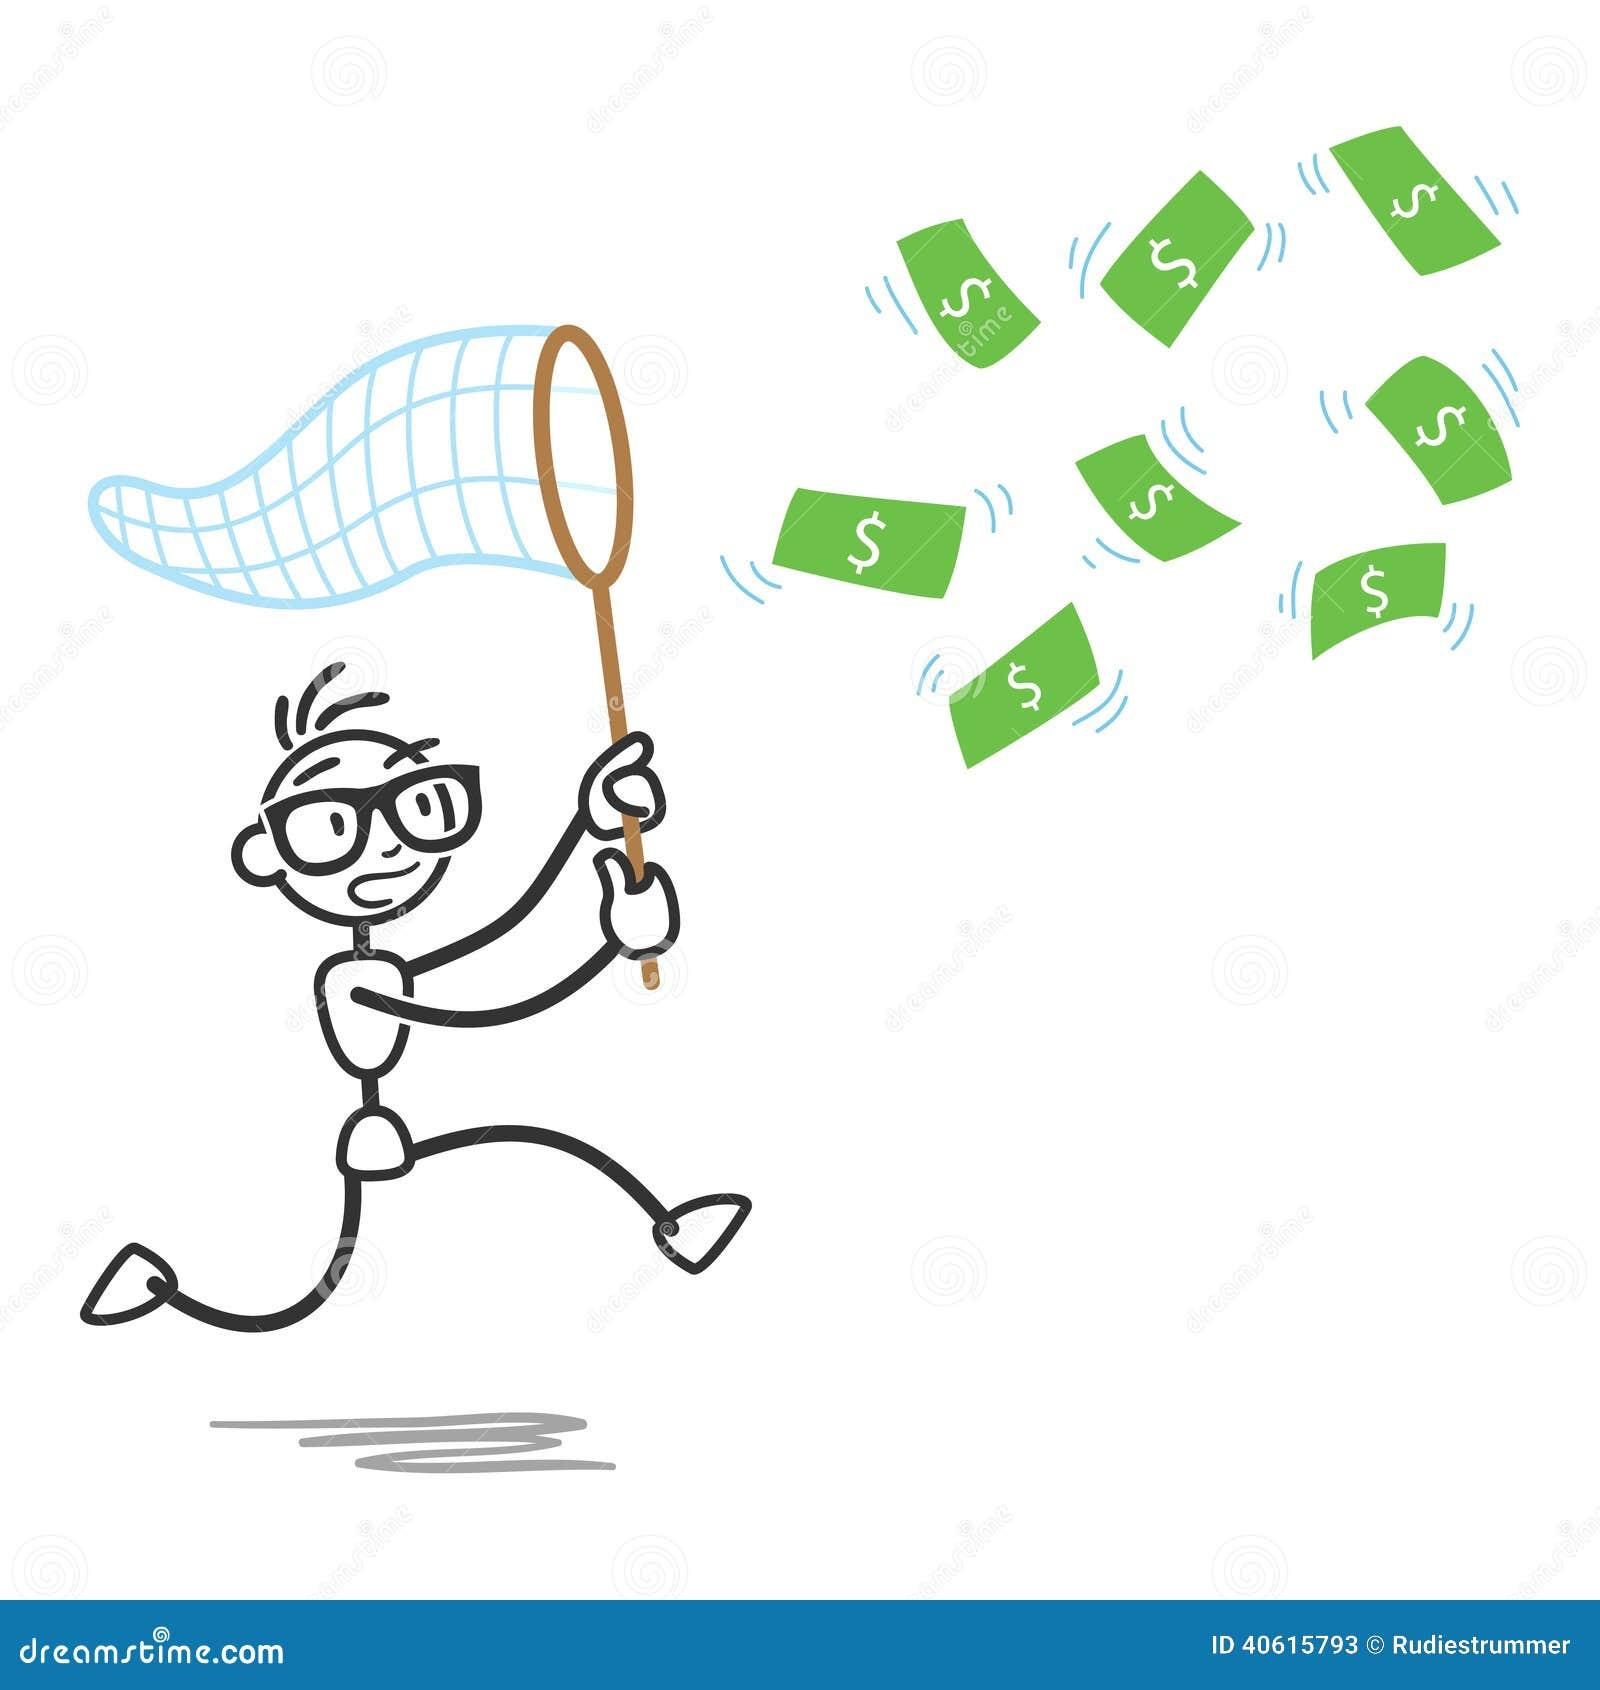 Stickman Money Bill Net Chasing Stock Vector - Image: 40615793